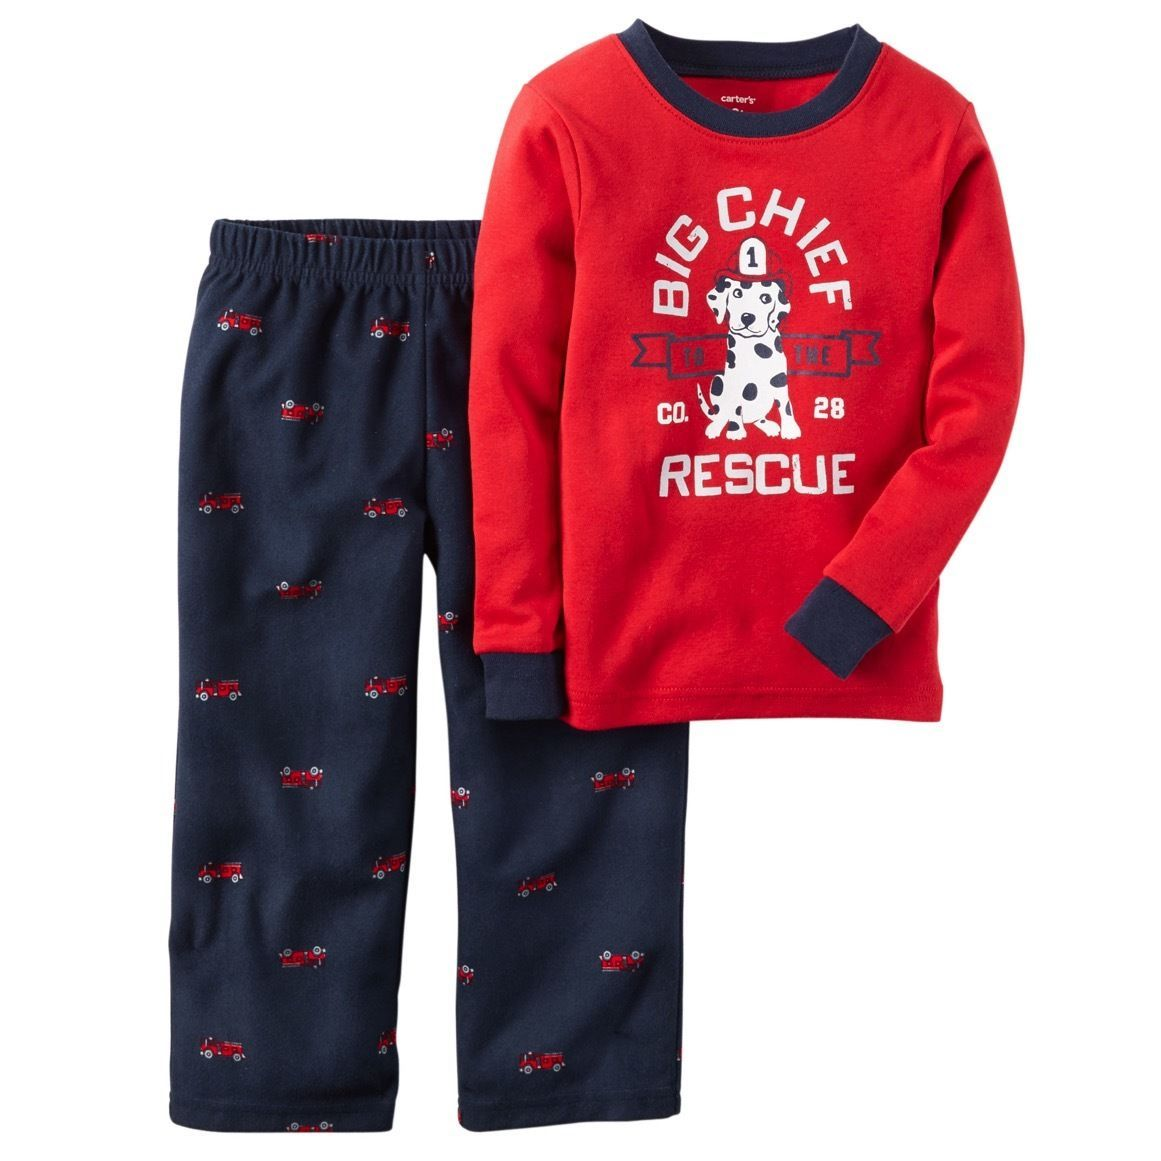 5bd6be9615a2  8.99 - Carter s Nwt 12M Baby Boy Cotton Fleece 2Pc Pj Pajama Set ...